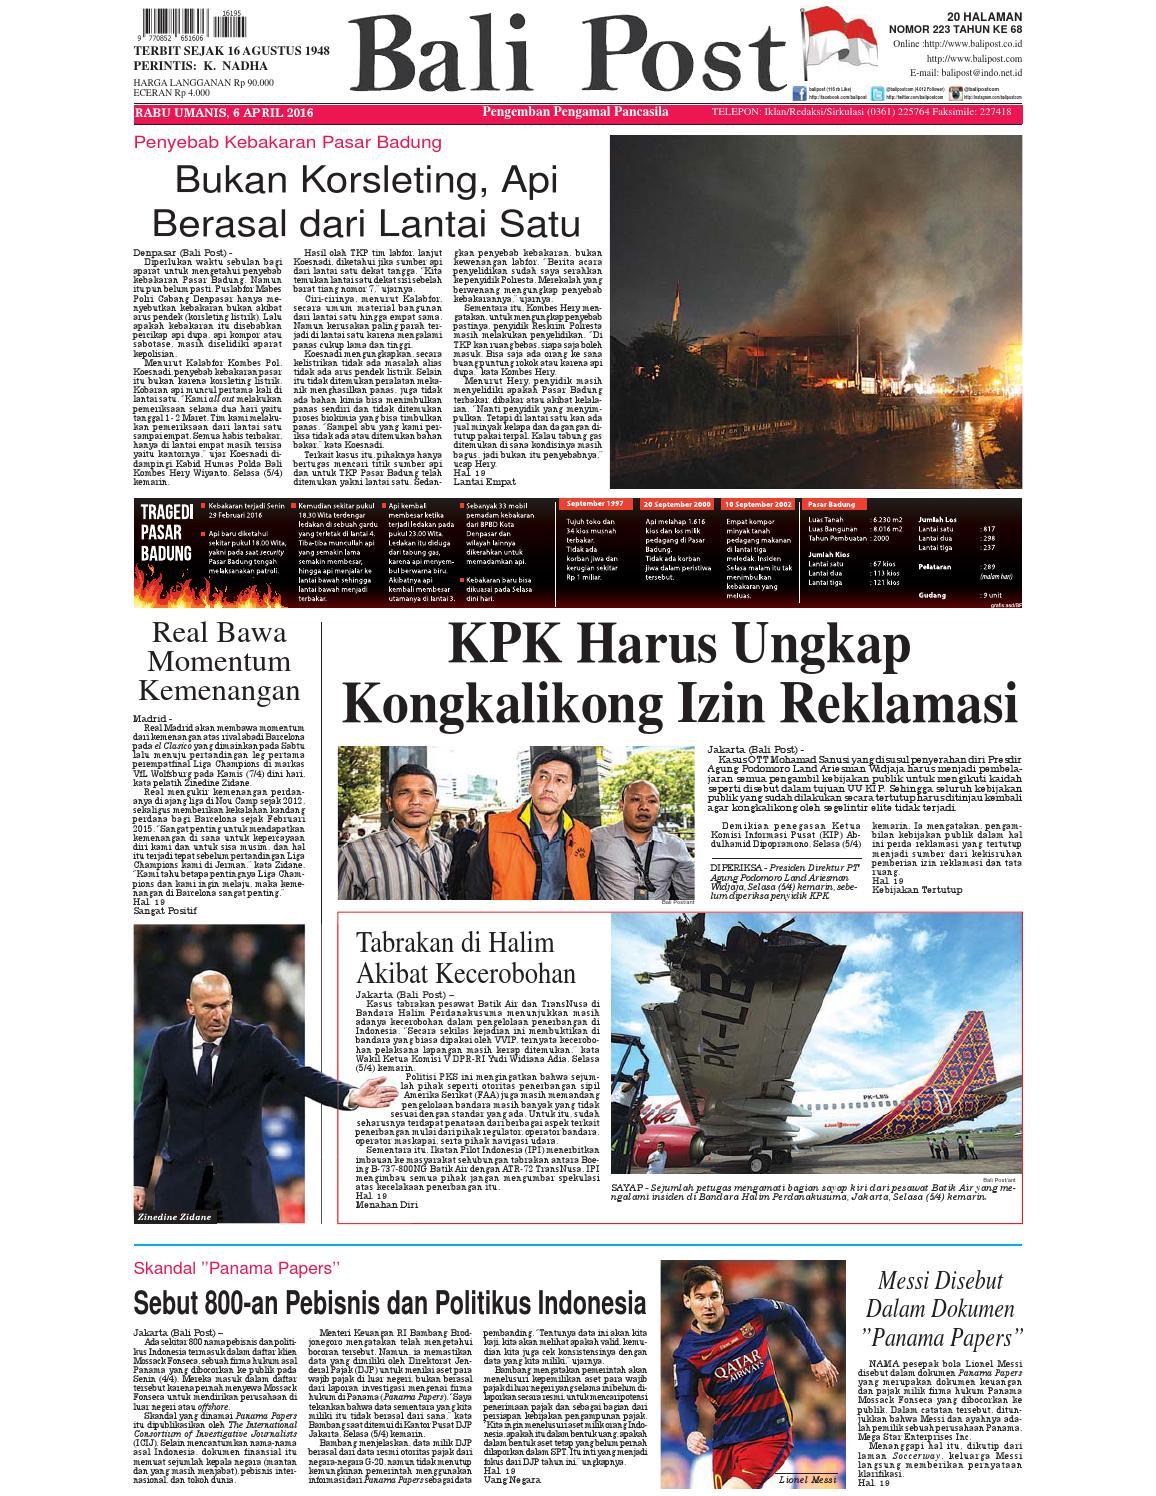 Edisi 06 April 2016 Balipostcom By E Paper Kmb Issuu Produk Ukm Bumn Tenun Pagatan Atasan Wanita 4